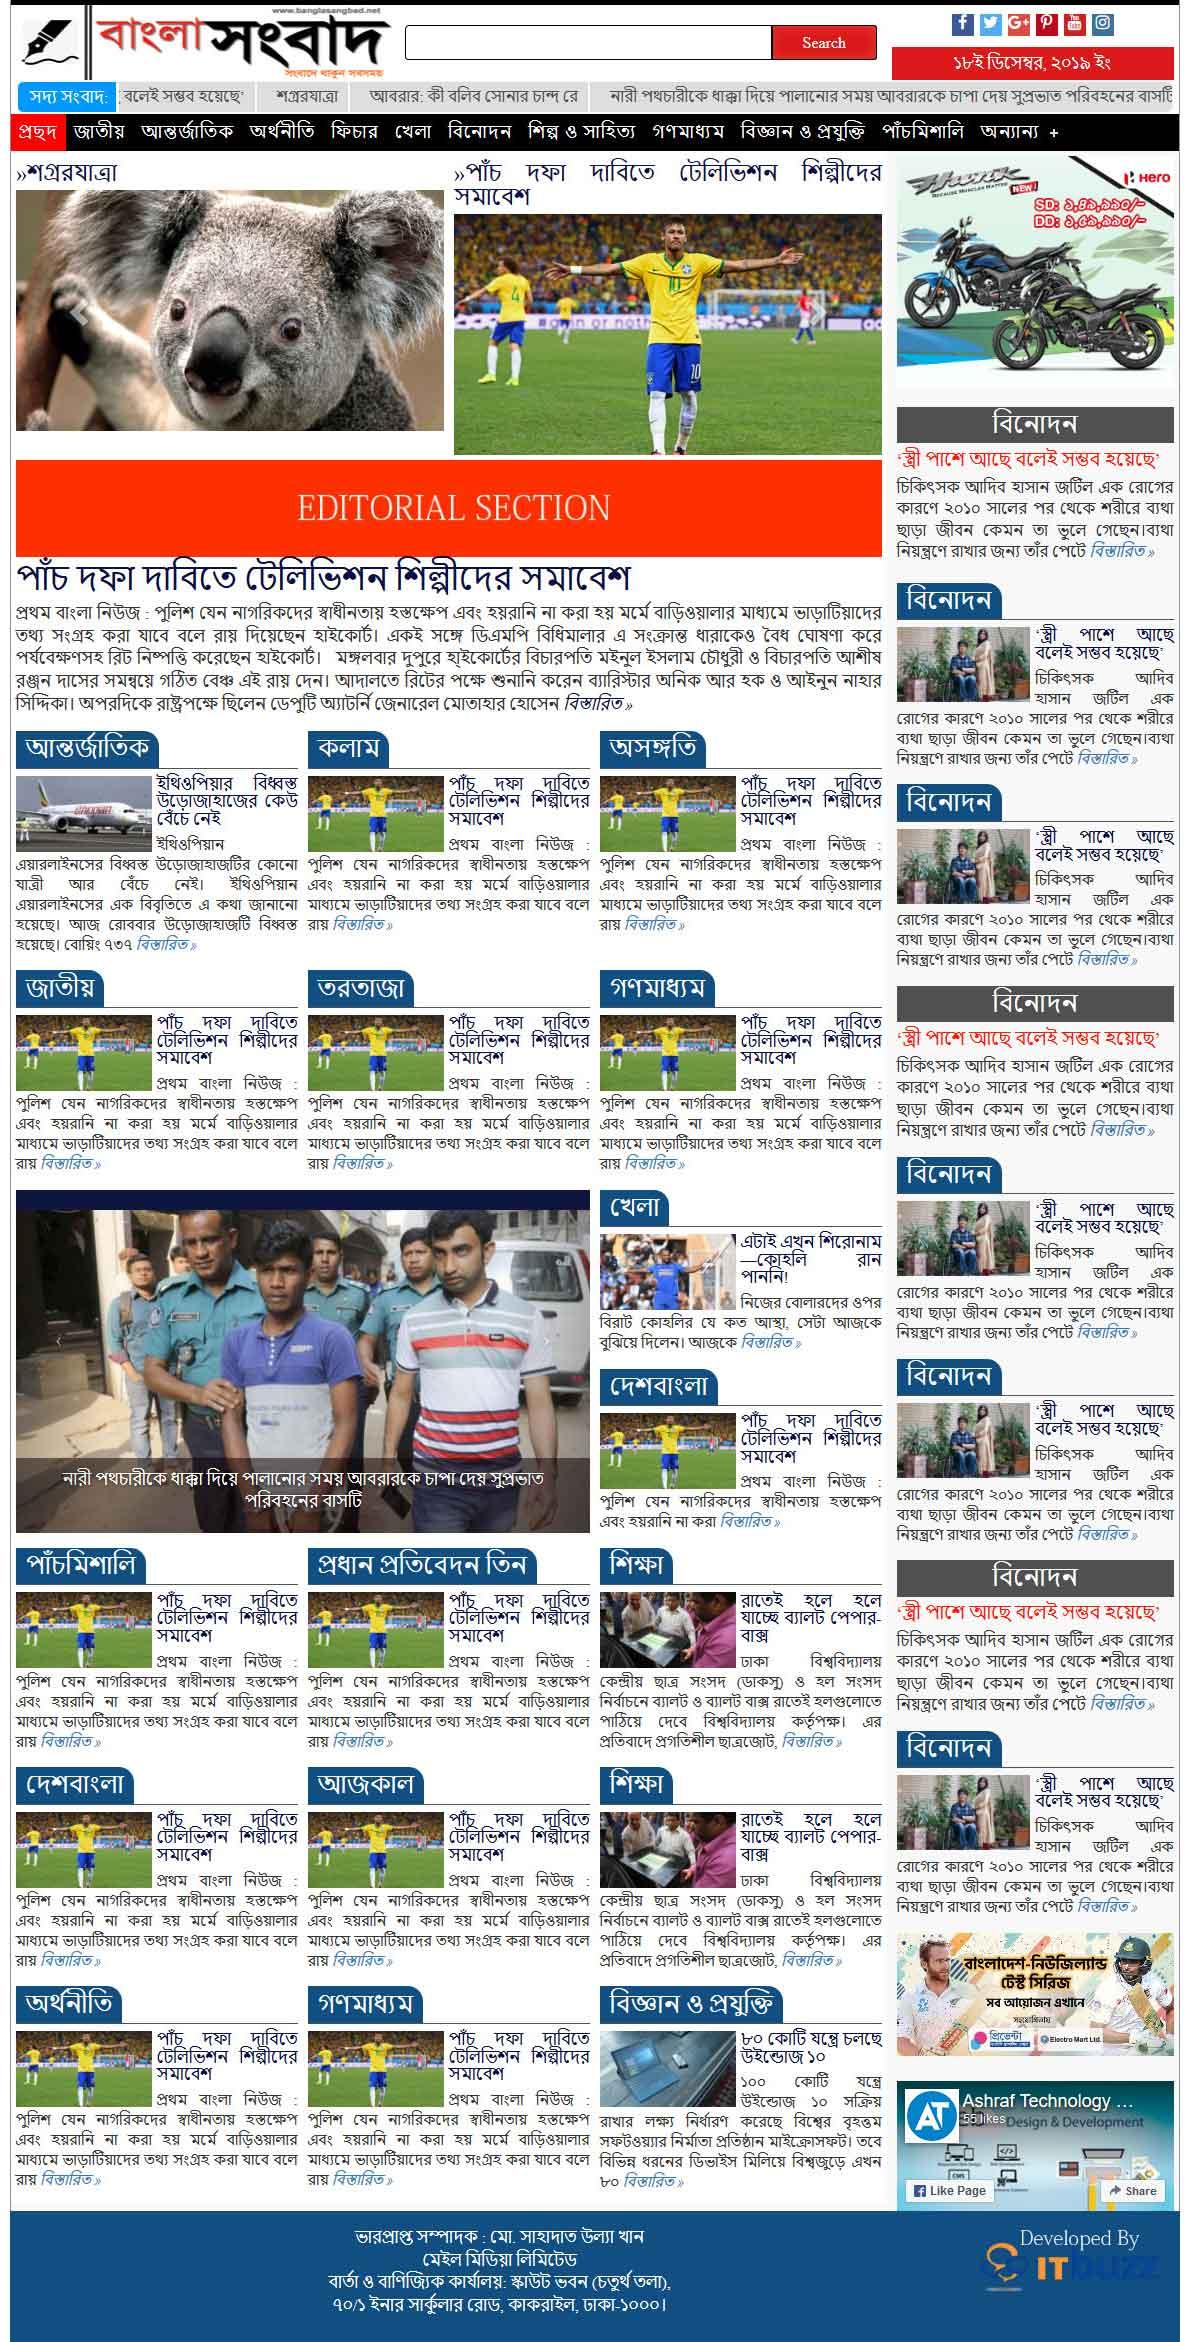 WordPress News Theme (Banglasangbad V-1)